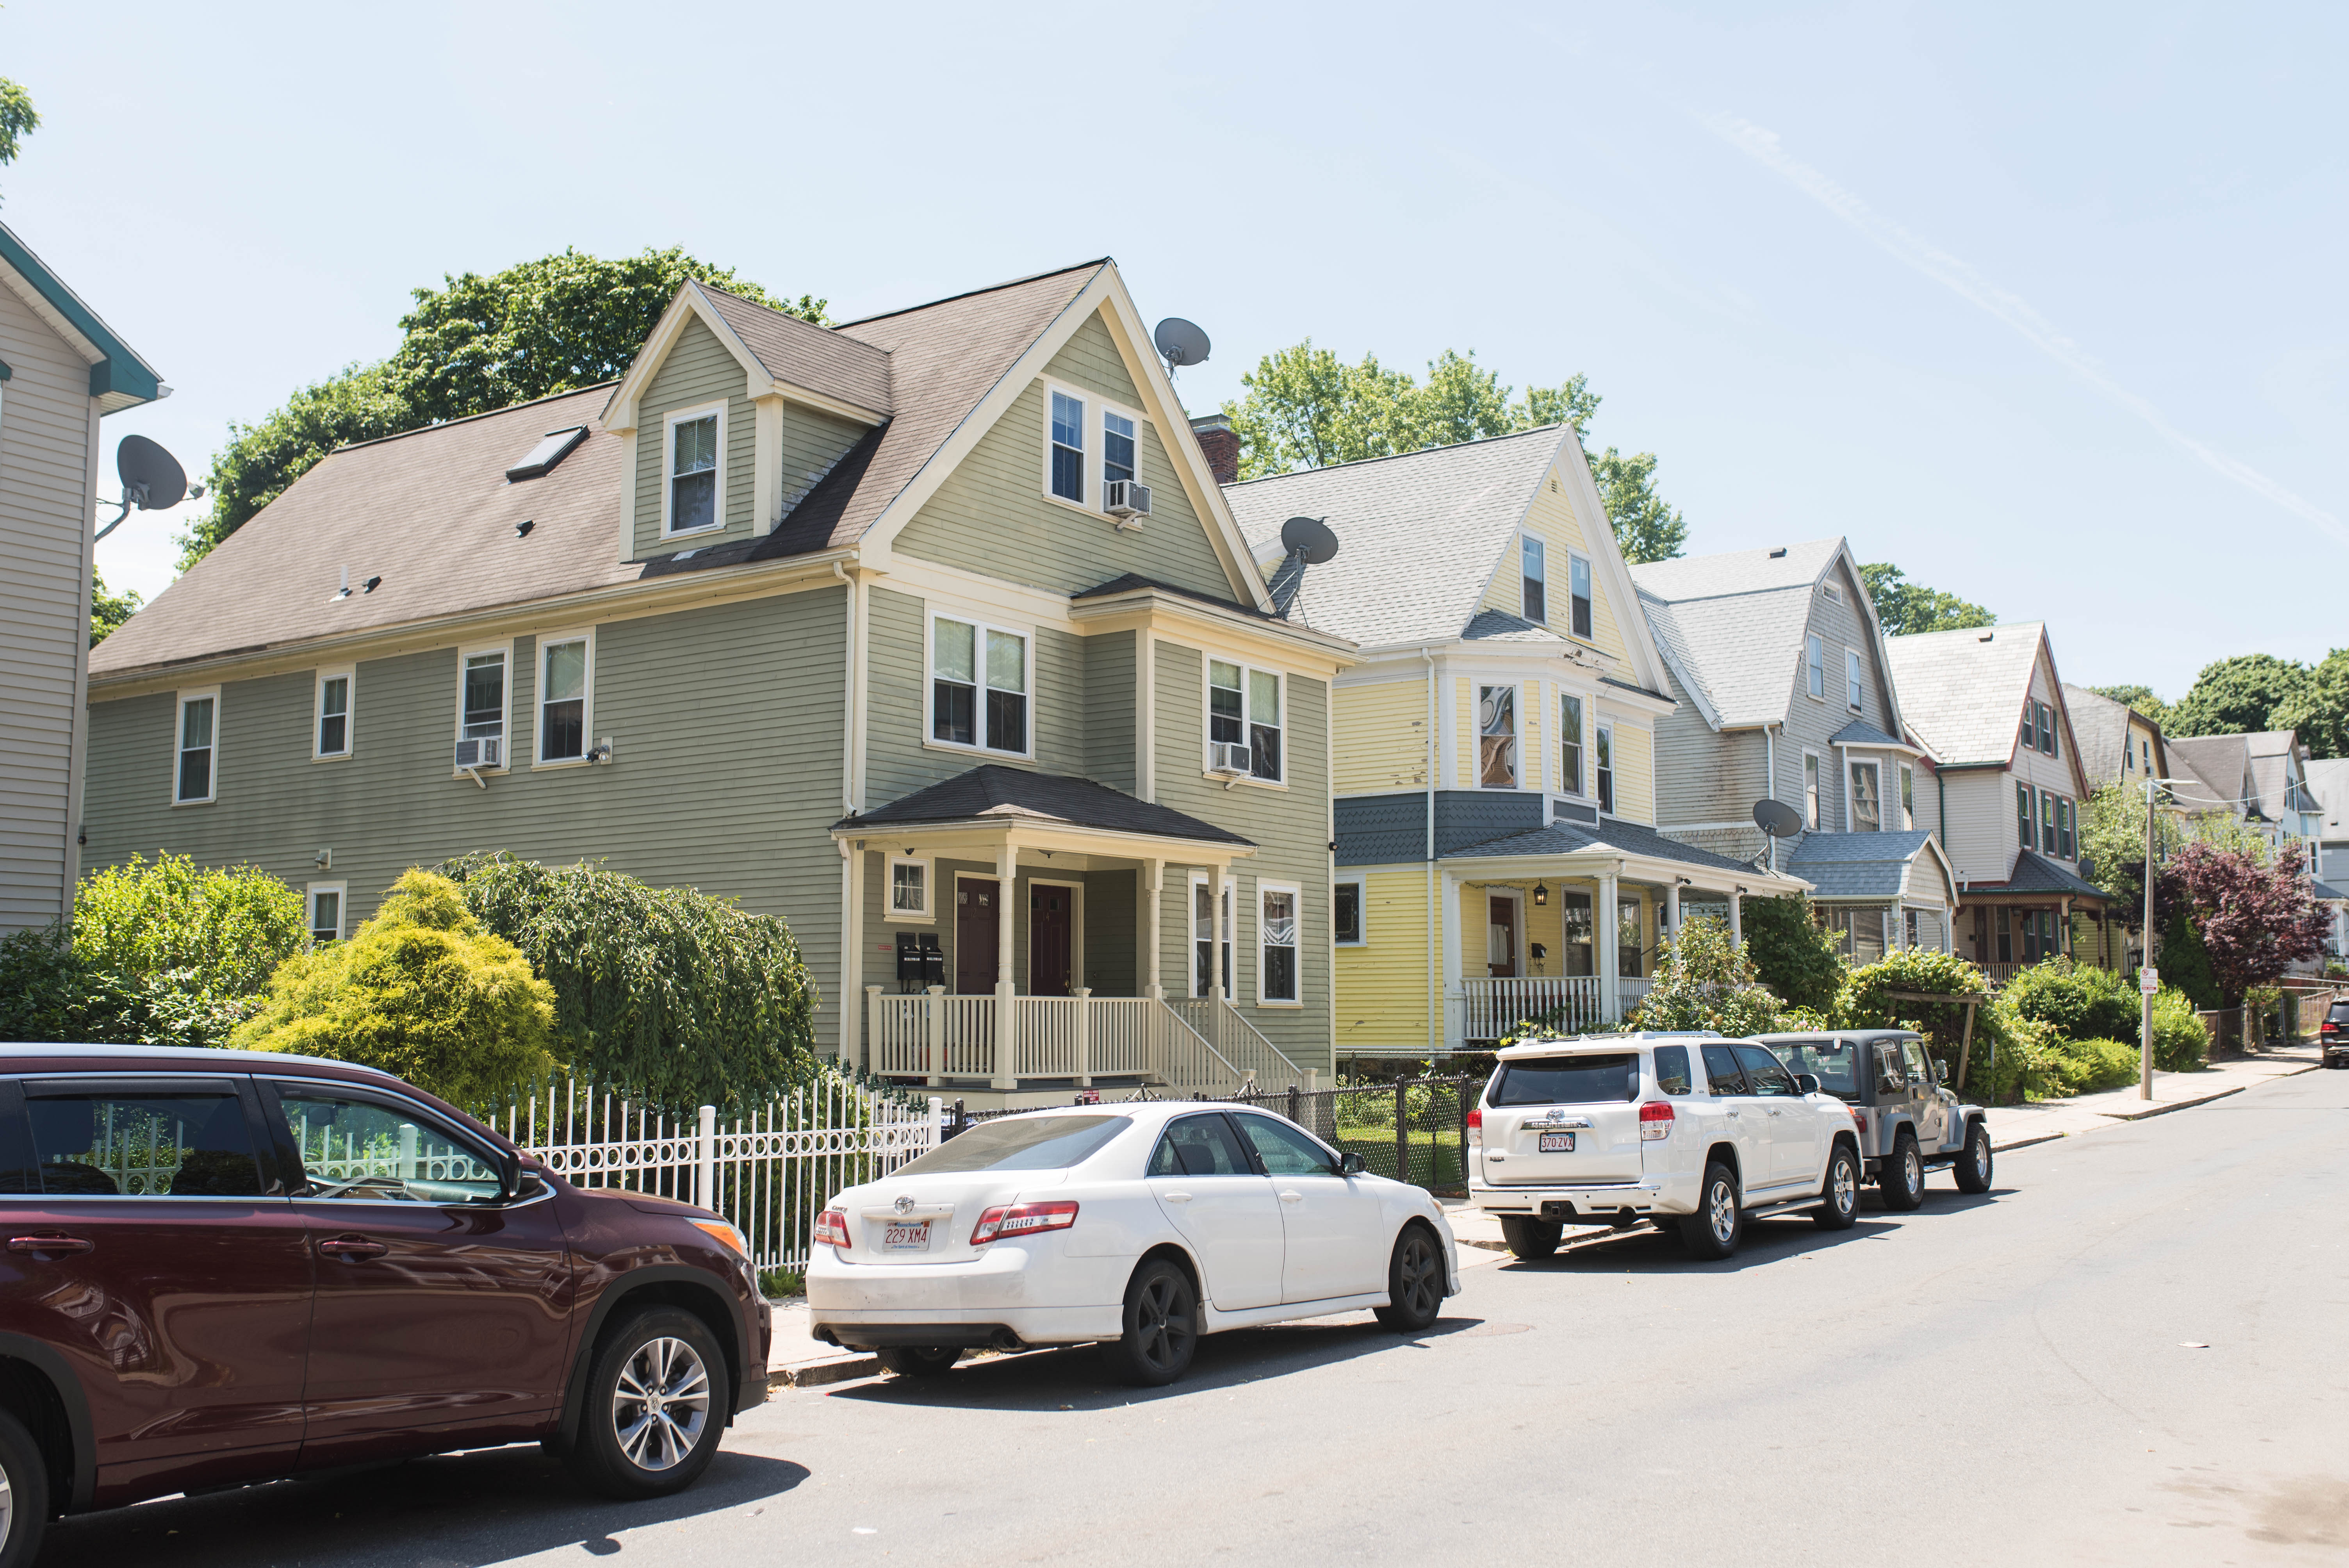 Single-family houses along a sunny street.